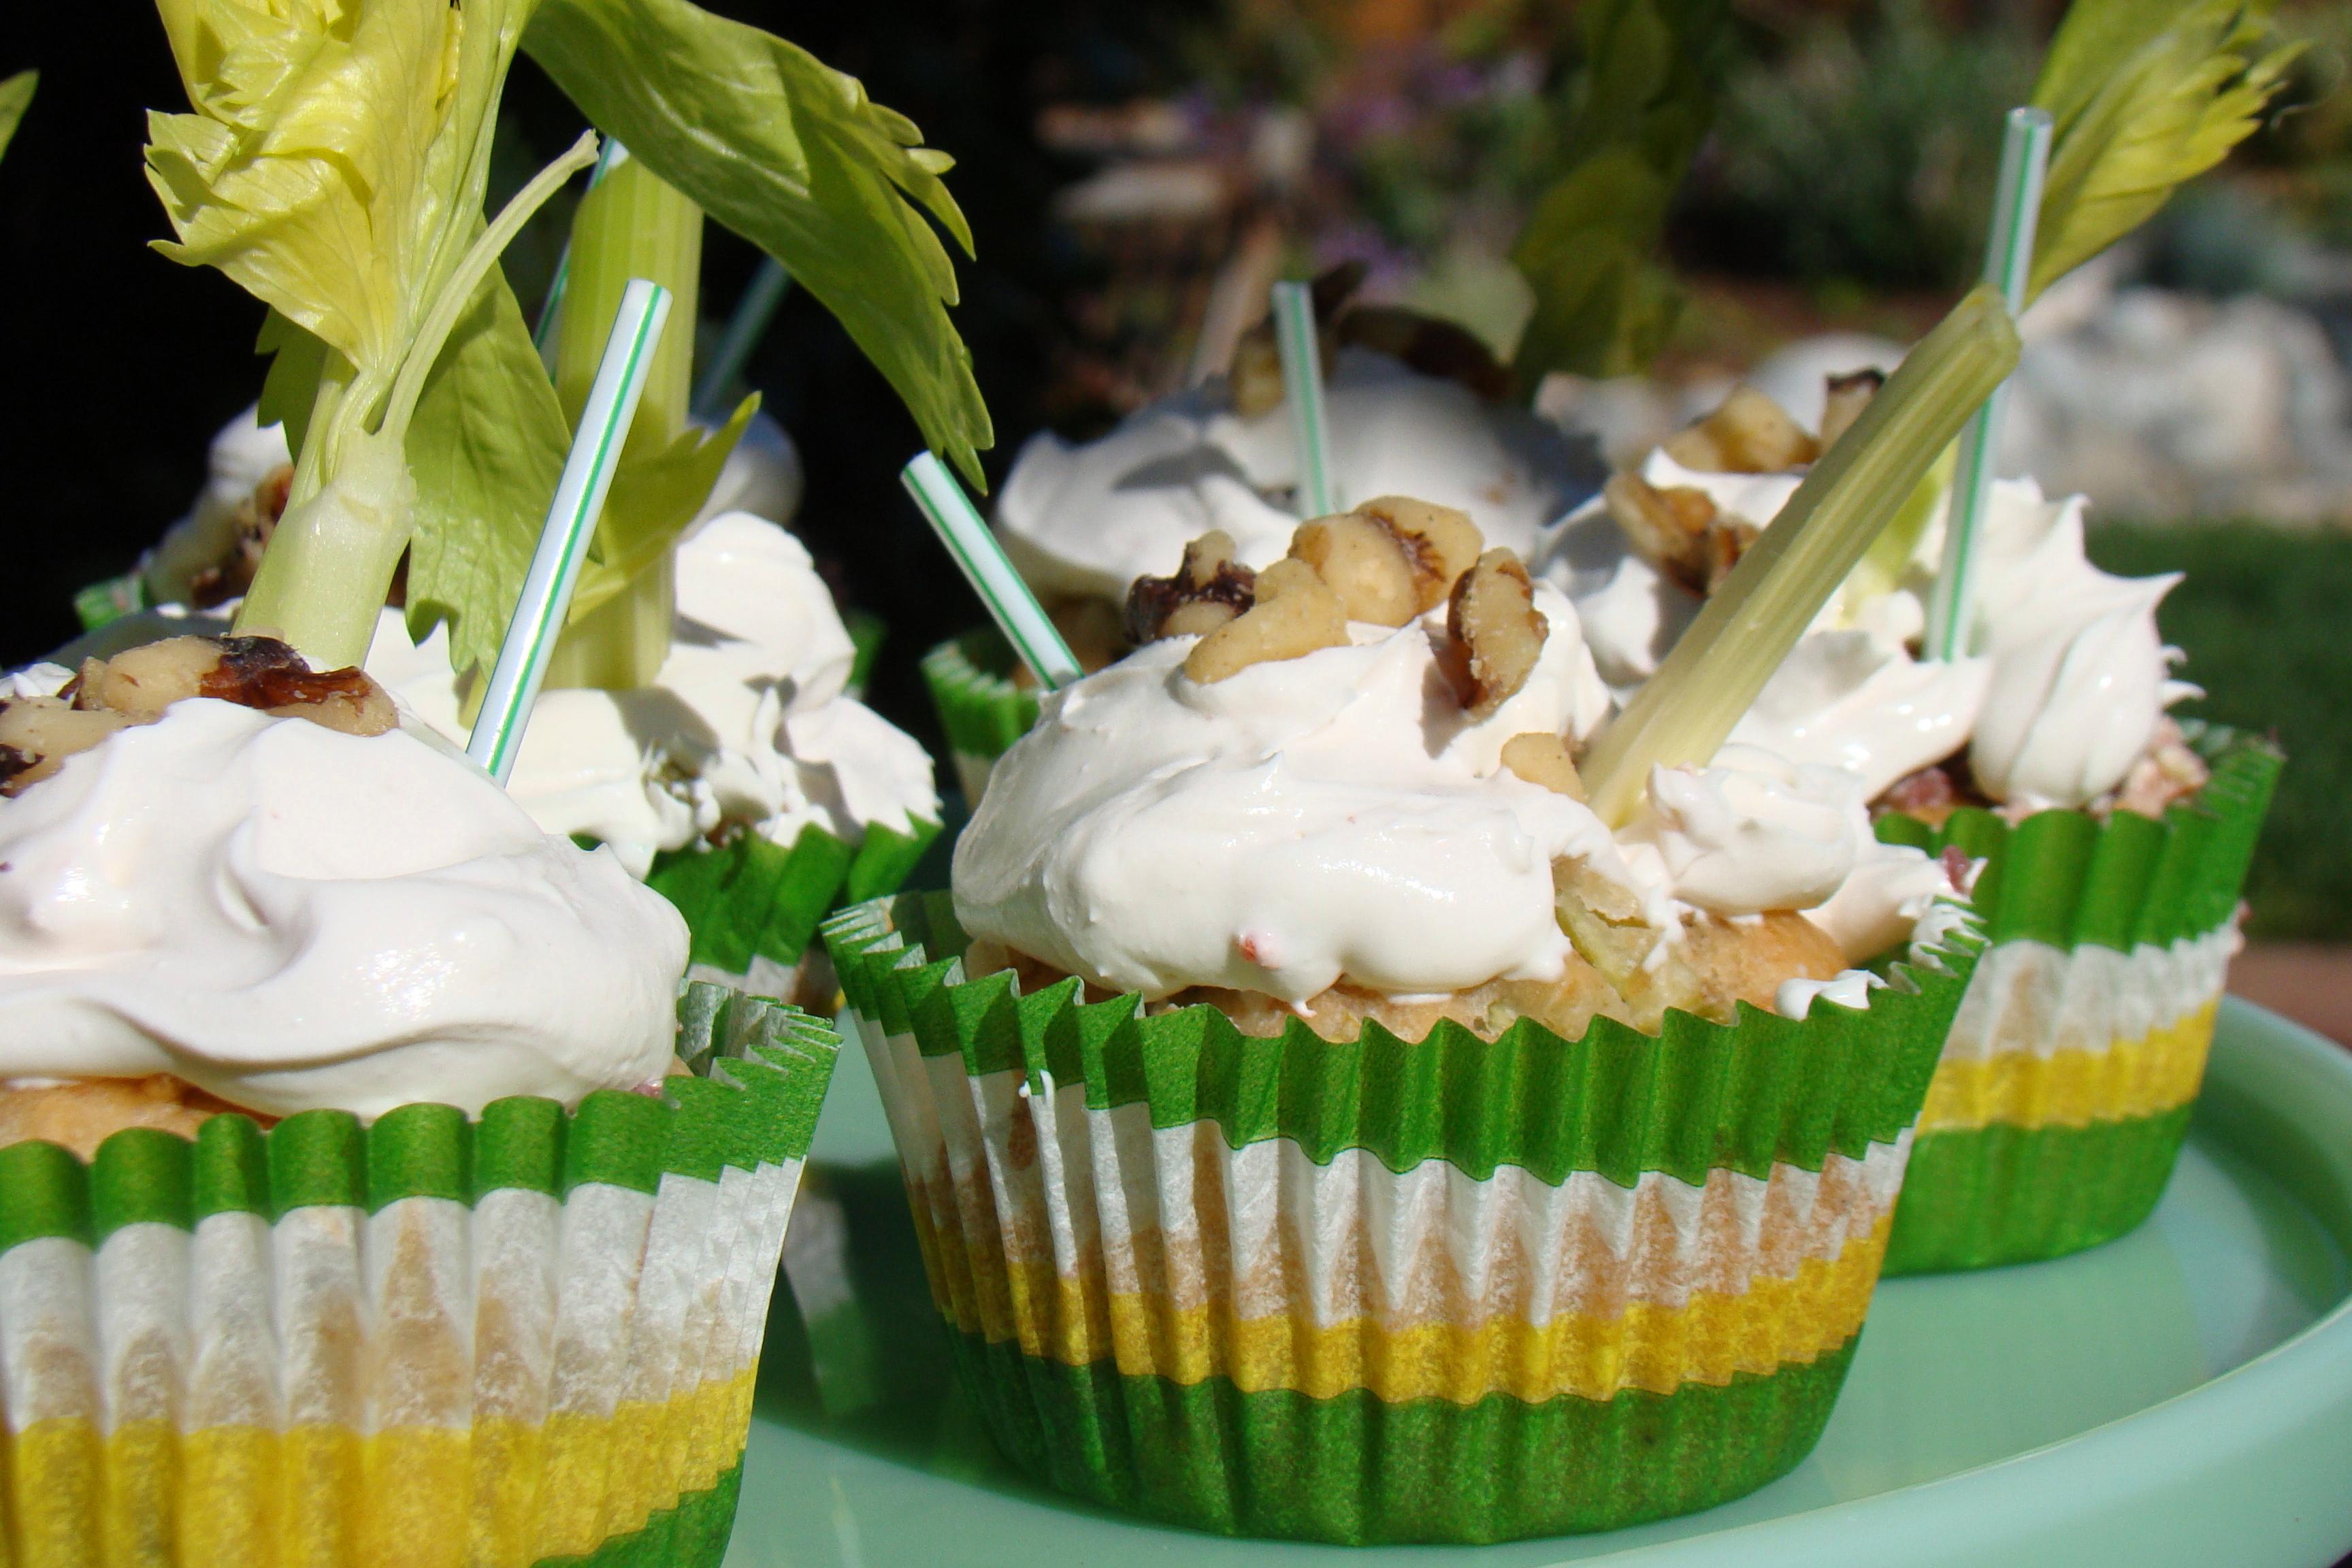 File:Savory Stuffed Celery Pop Cupcakes.jpg - Wikimedia Commons